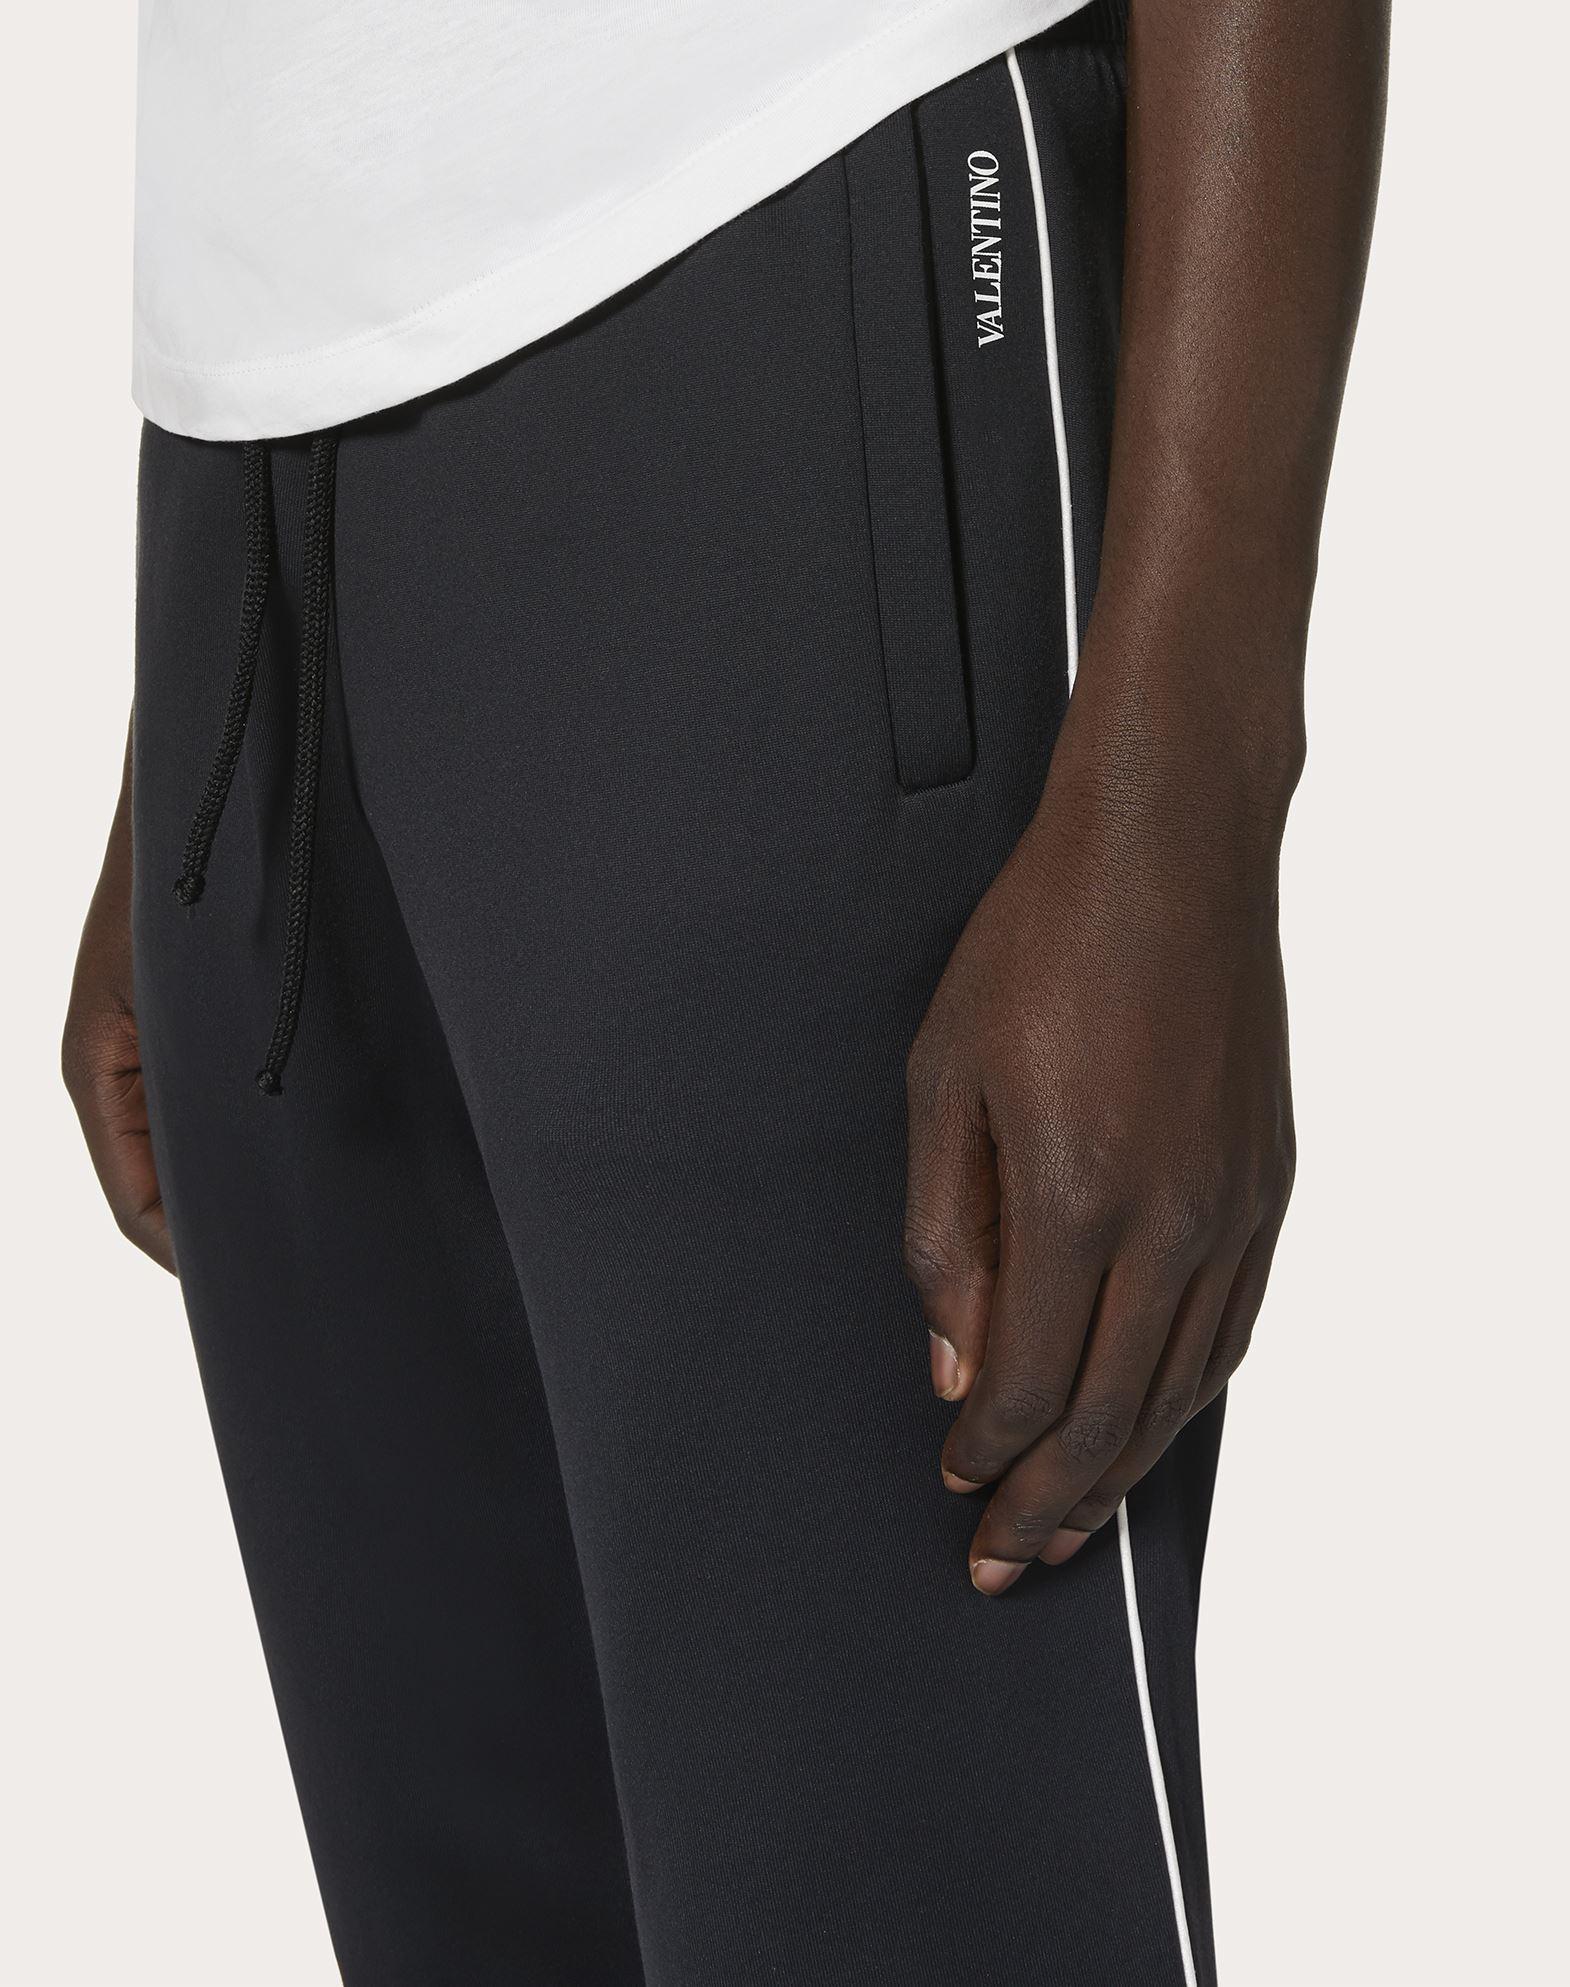 VALENTINO UOMO Pantalones jogger de punto   Pantalón U a